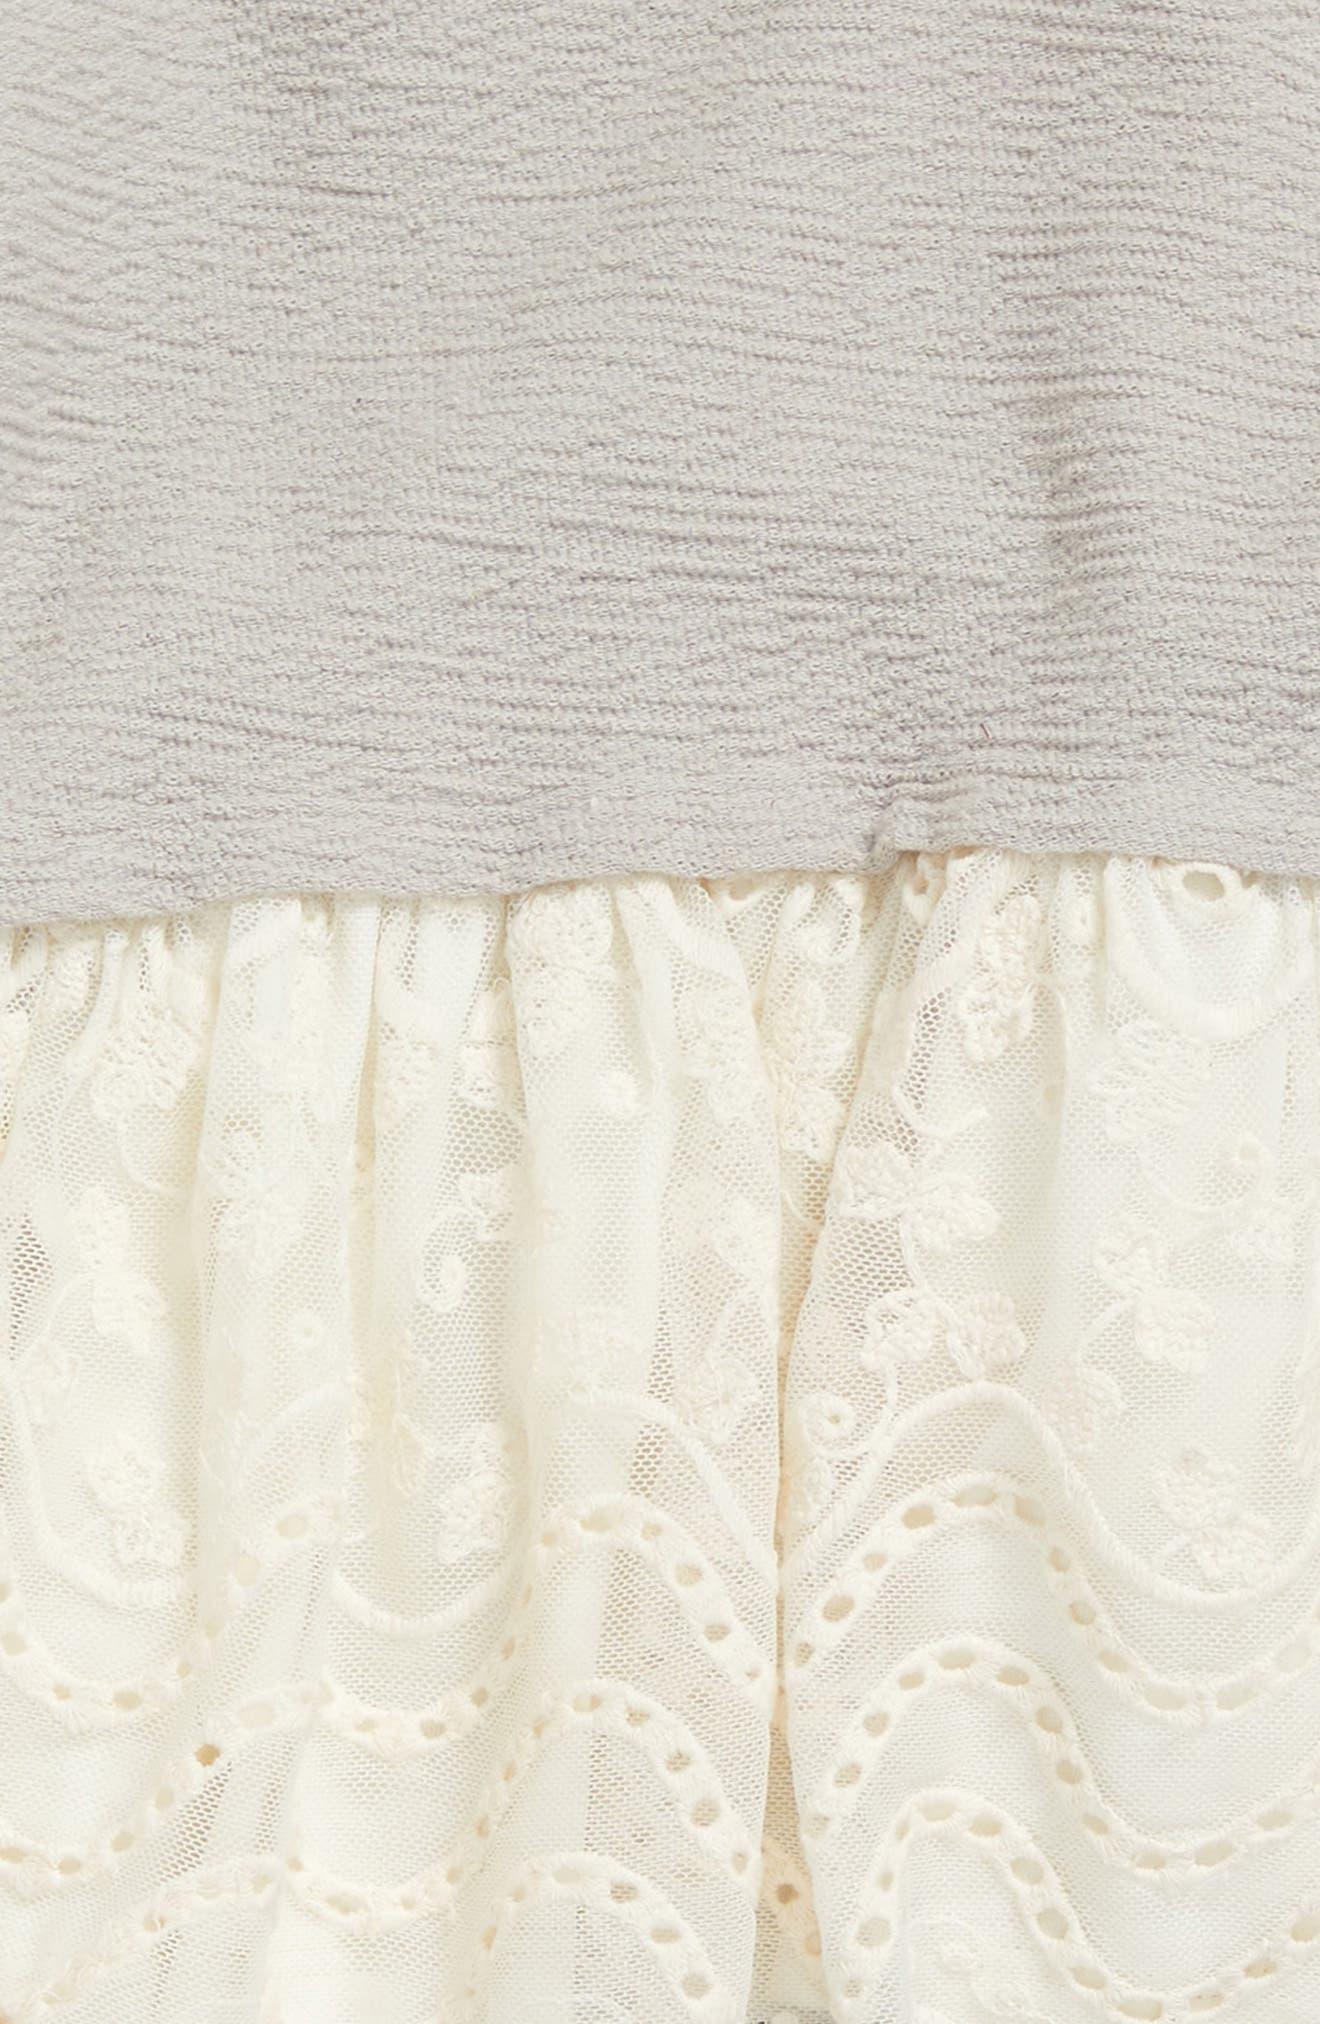 Lace Peplum Top & Leggings Set,                             Main thumbnail 1, color,                             025